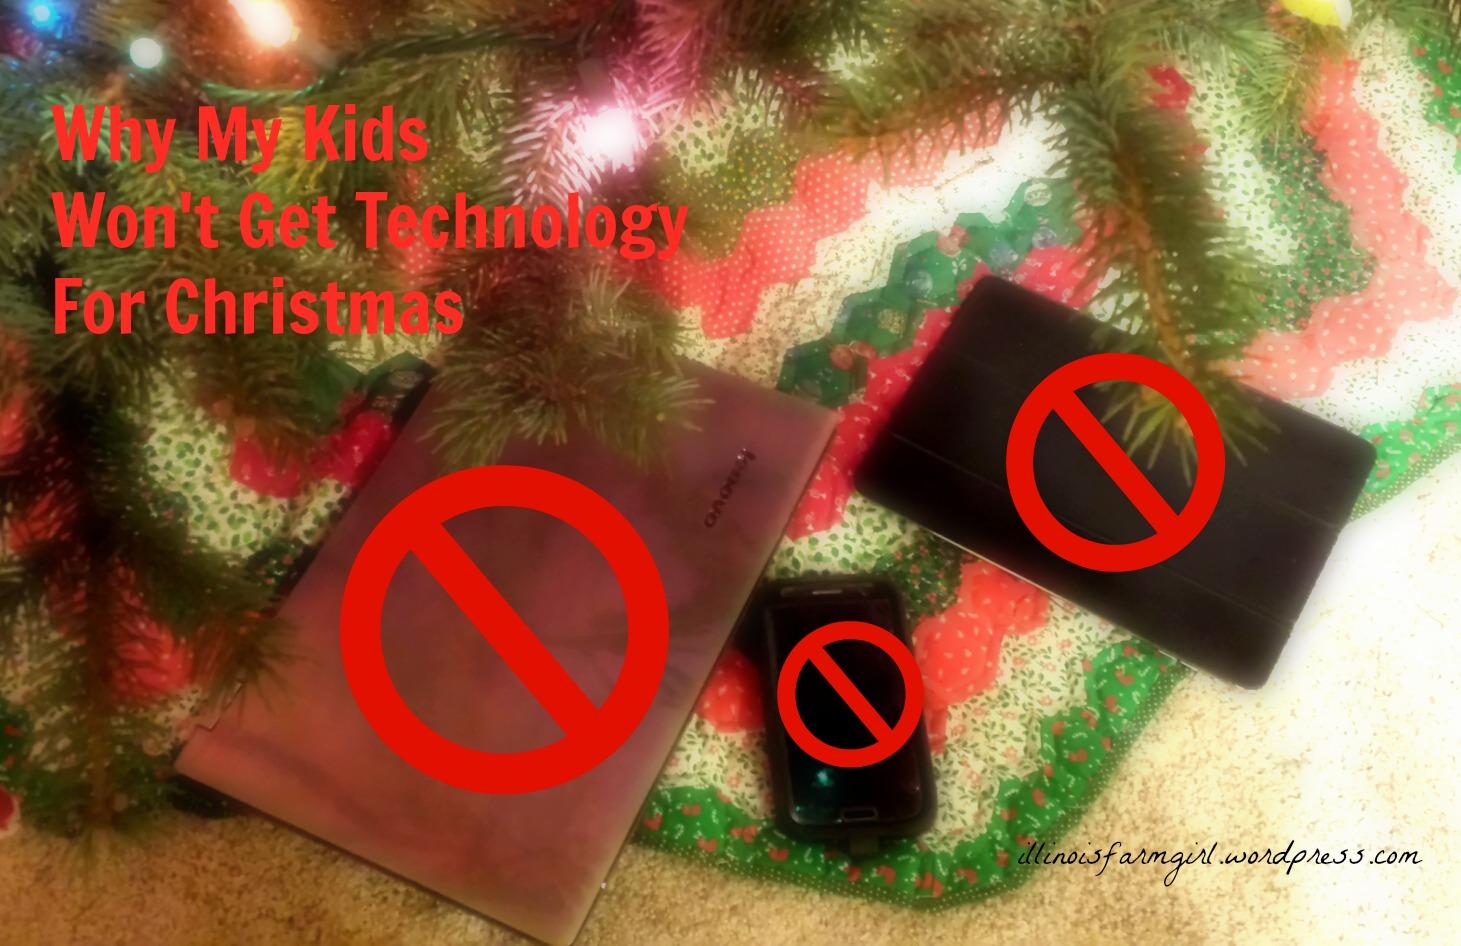 No Tech for Christmas